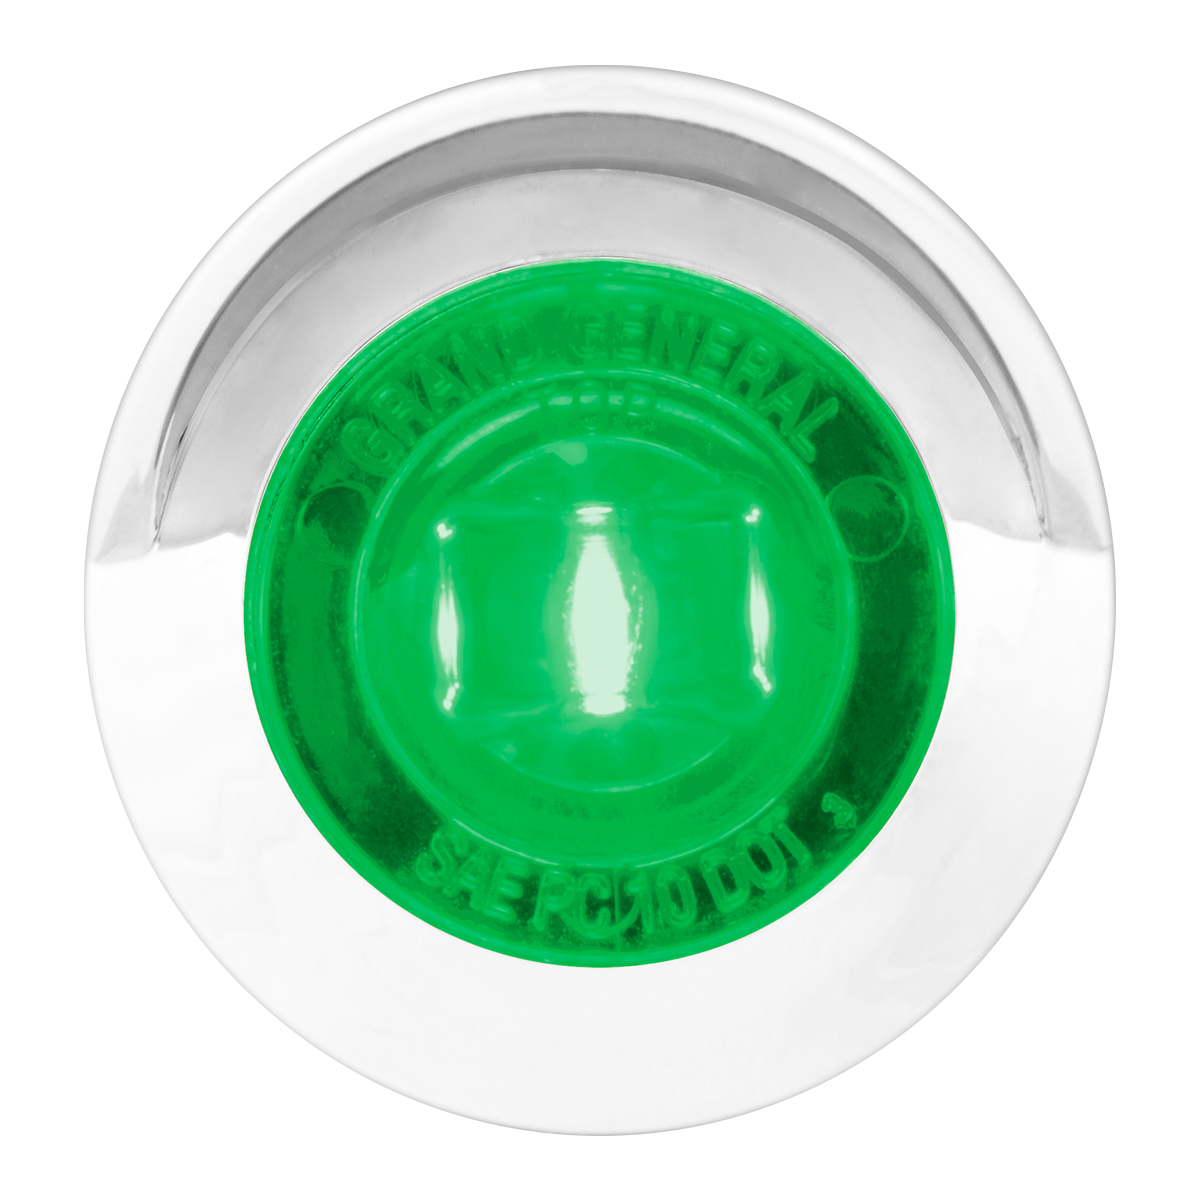 "75236 1-1/4"" Dia. Dual Function LED Light with Chrome Plastic Bezel w/ Visor and Nut"